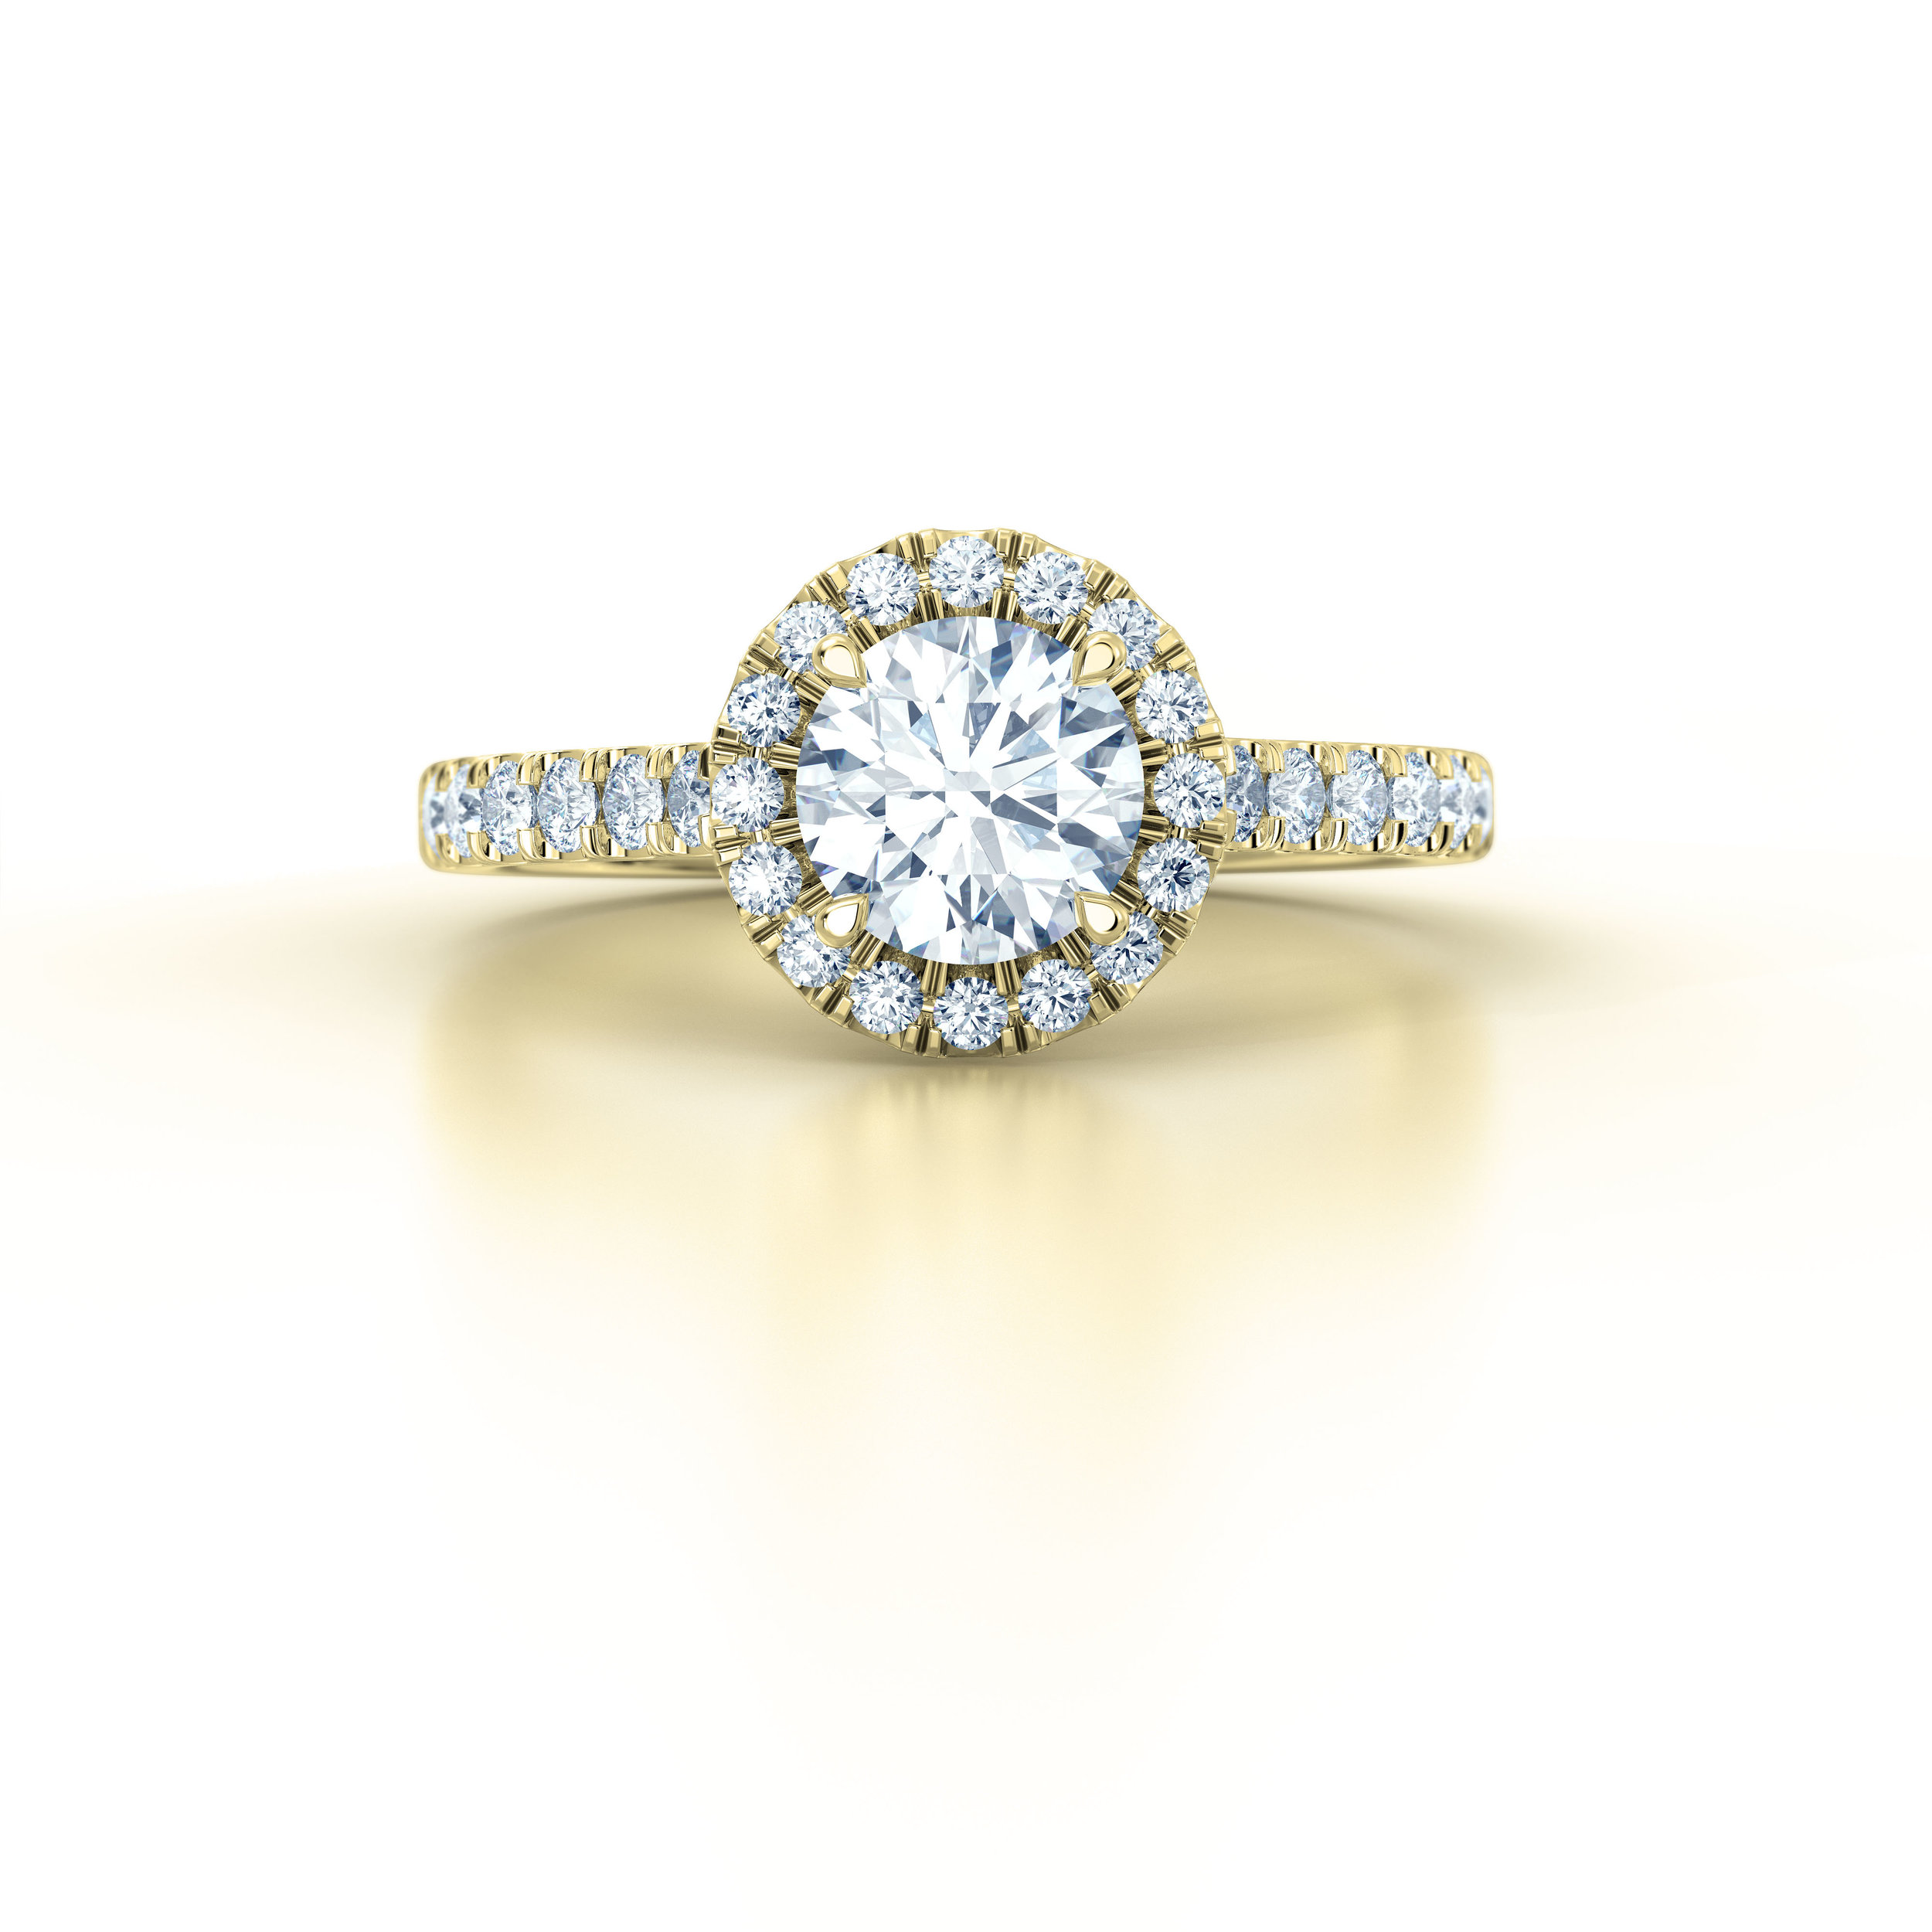 Brilliant cut diamond halo engagement ring